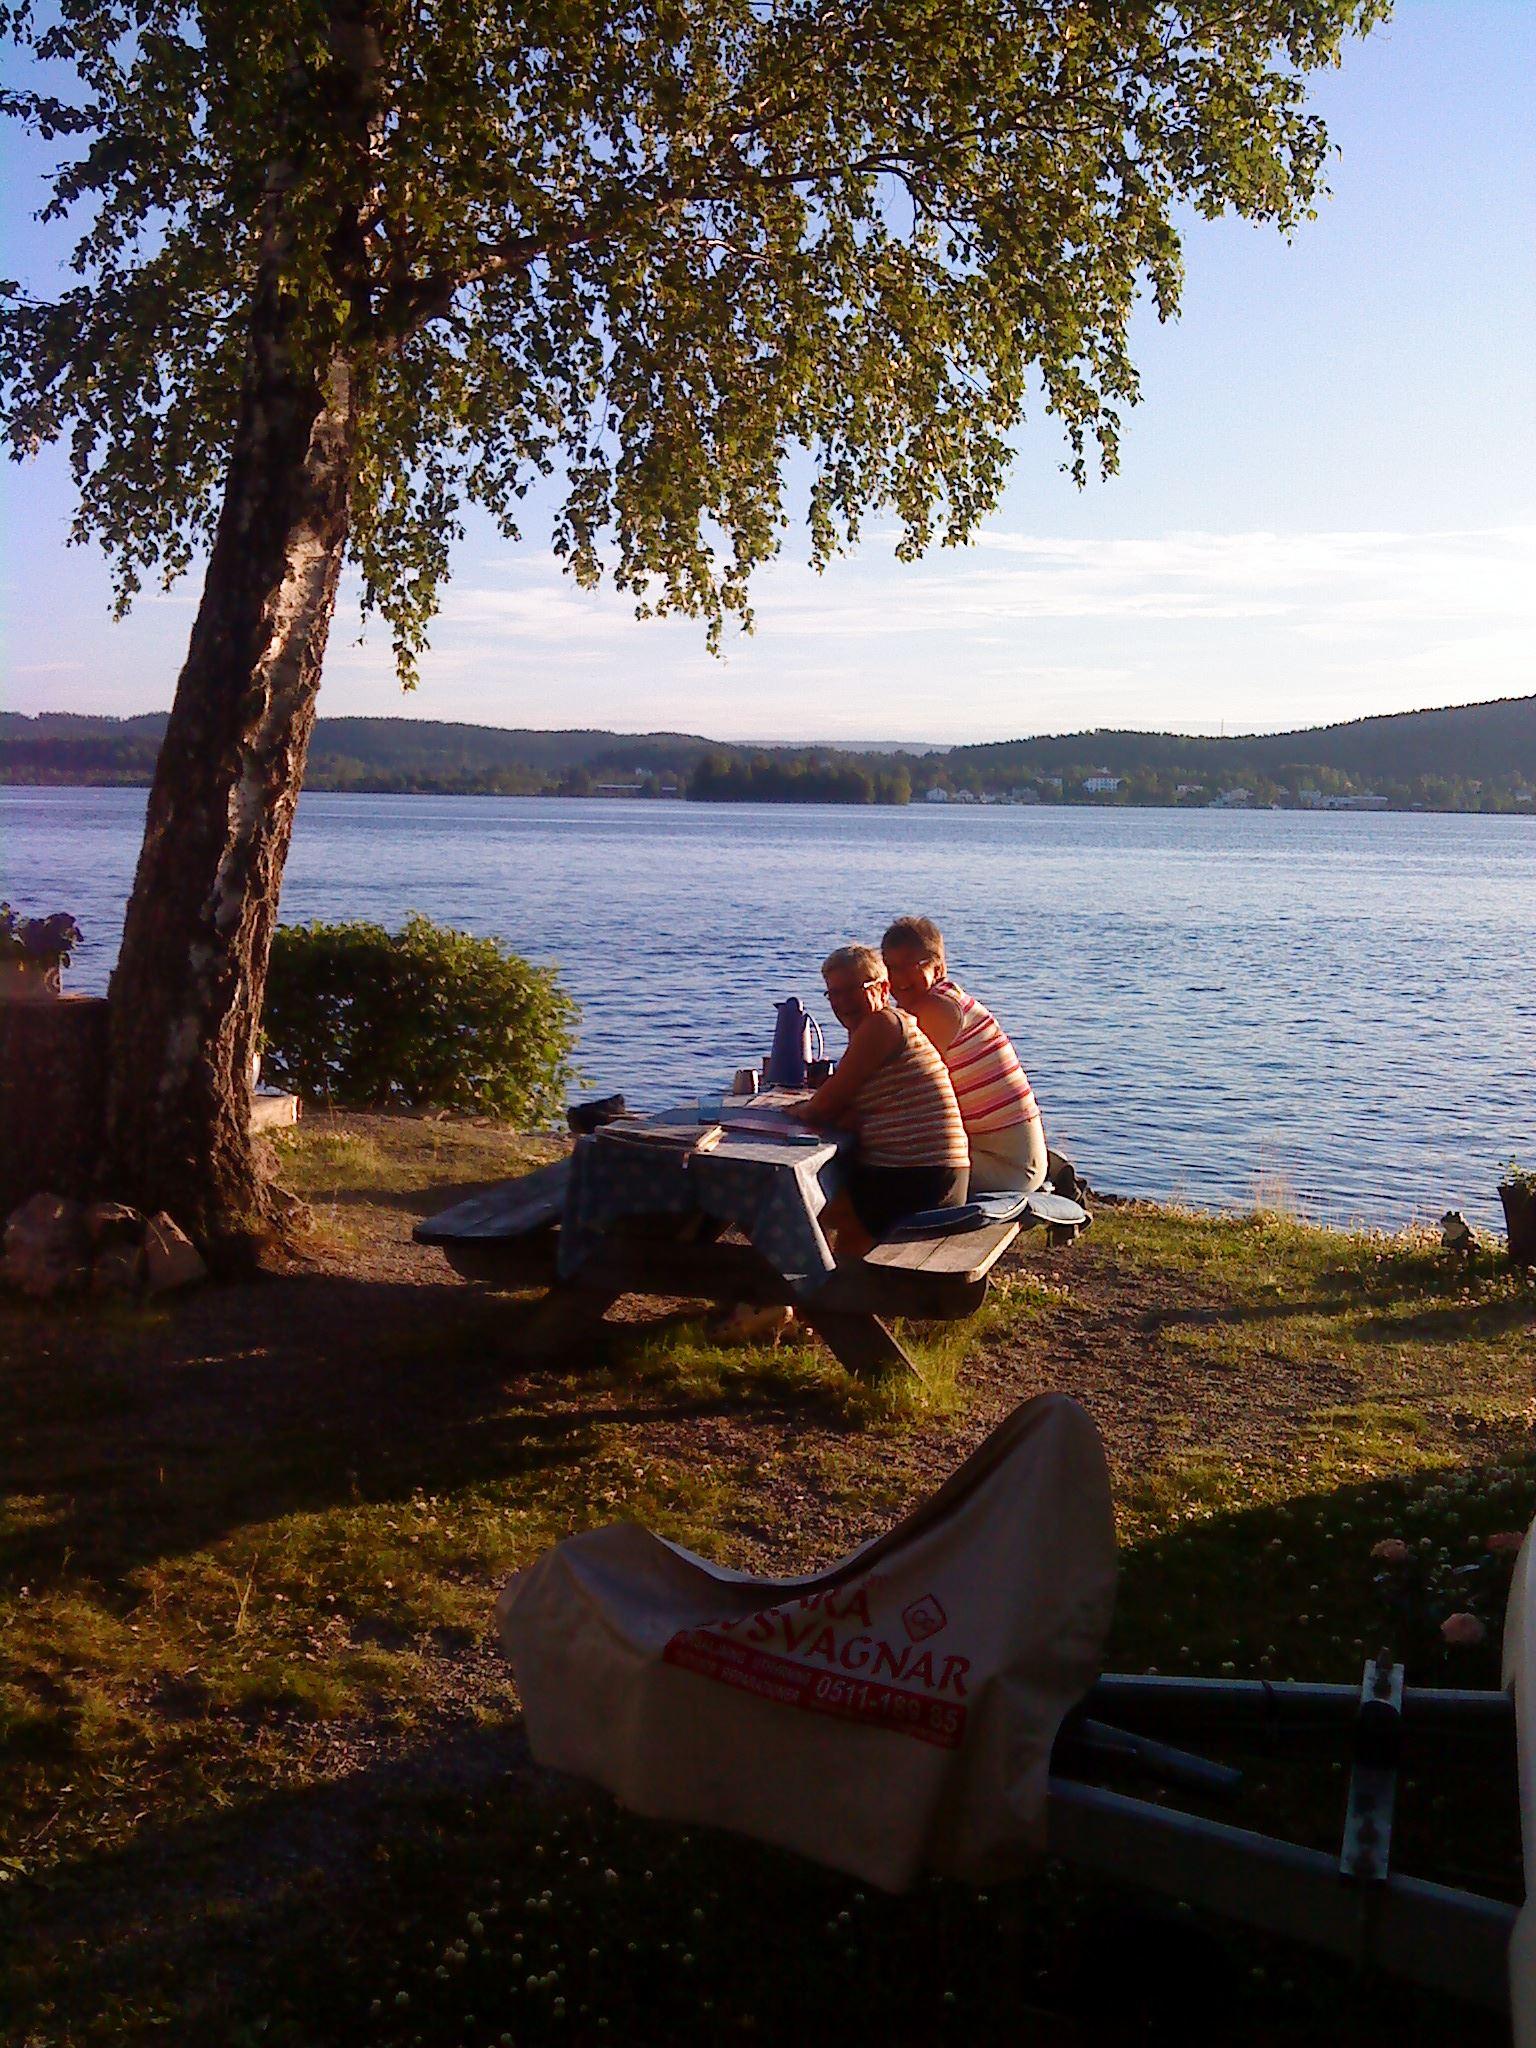 Sandslåns Vandrarhem & Camping i Kramfors